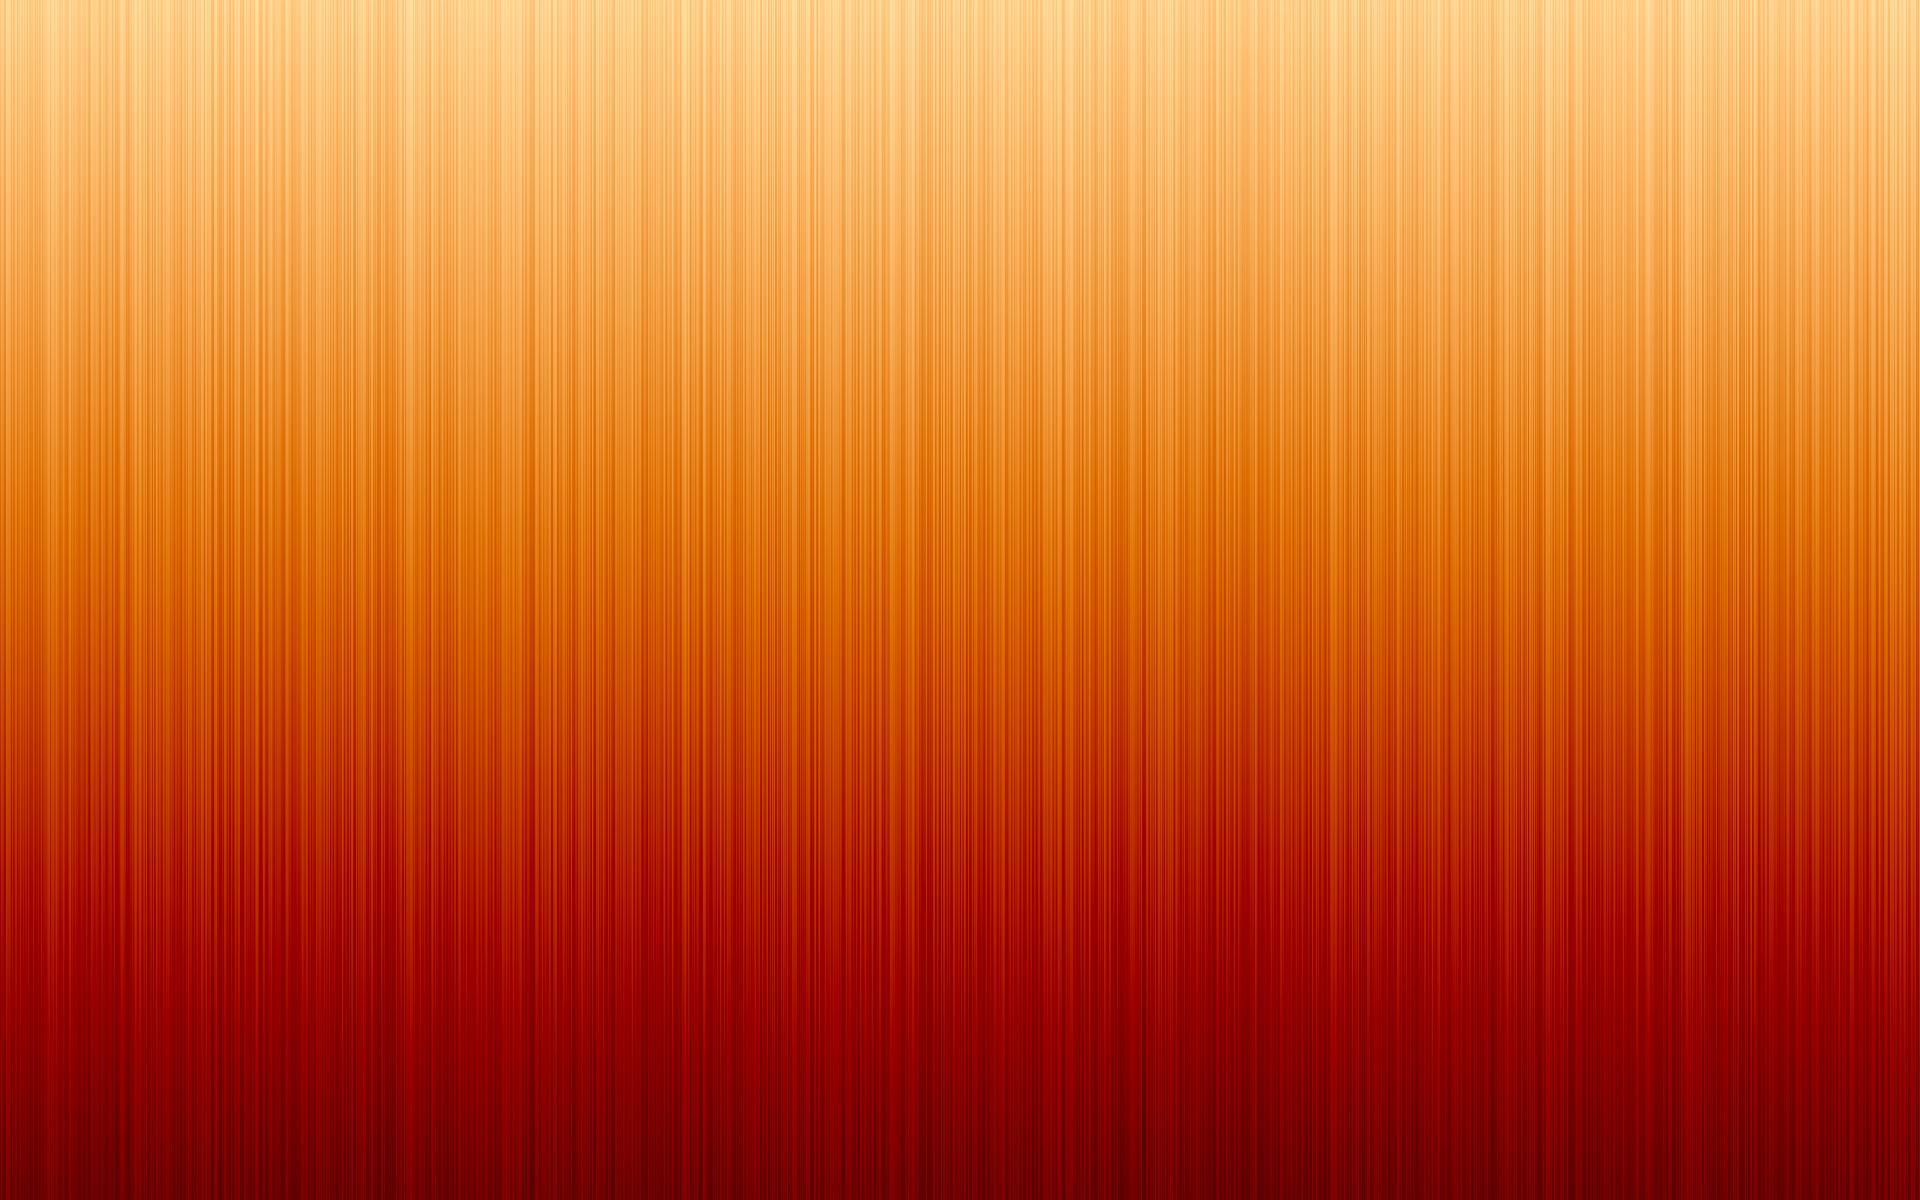 Orange Wallpapers HD - Wallpaper Cave